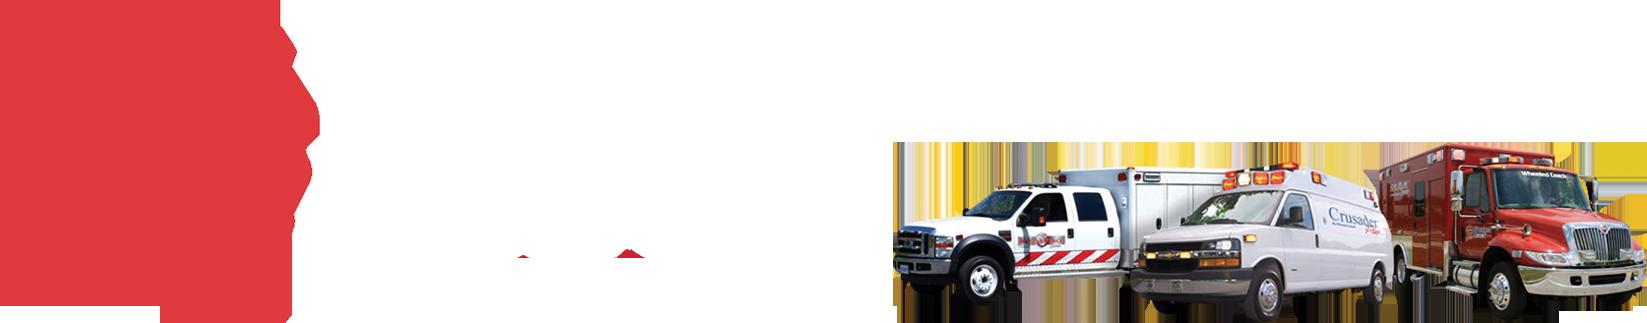 WC_Banner wheeled coach ambulances wheeled coach ambulance wiring diagrams at readyjetset.co